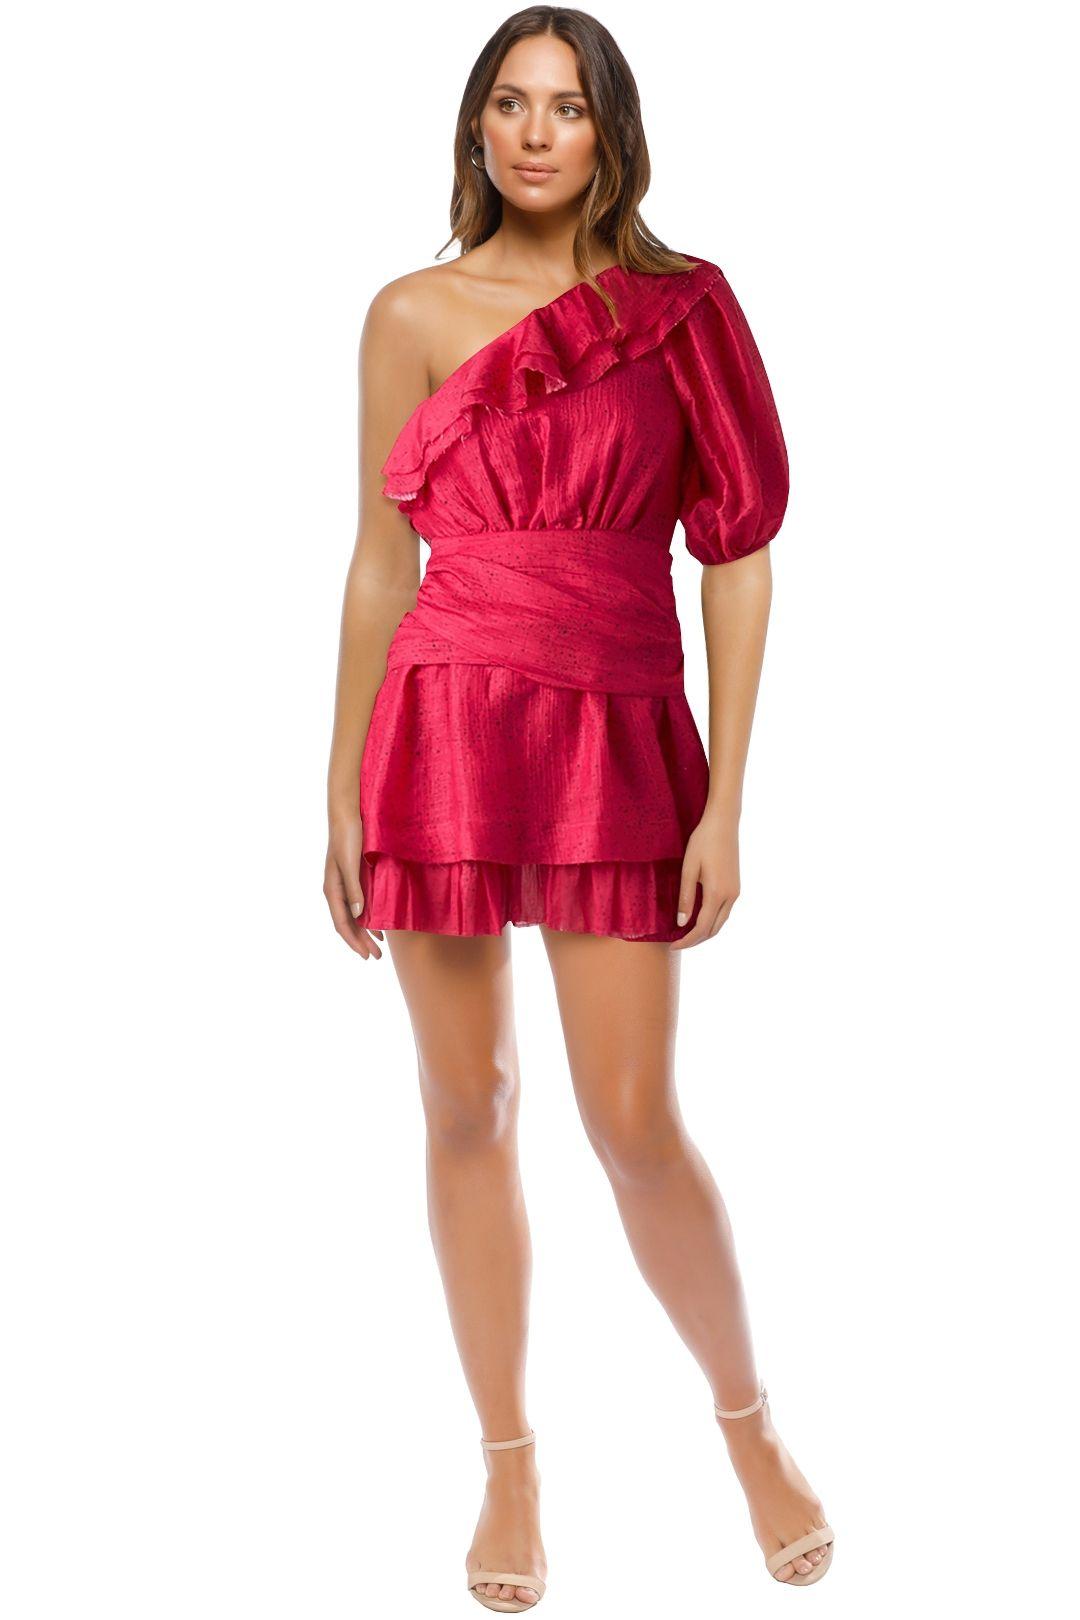 AJE - Elvire Dress - Pink - Front